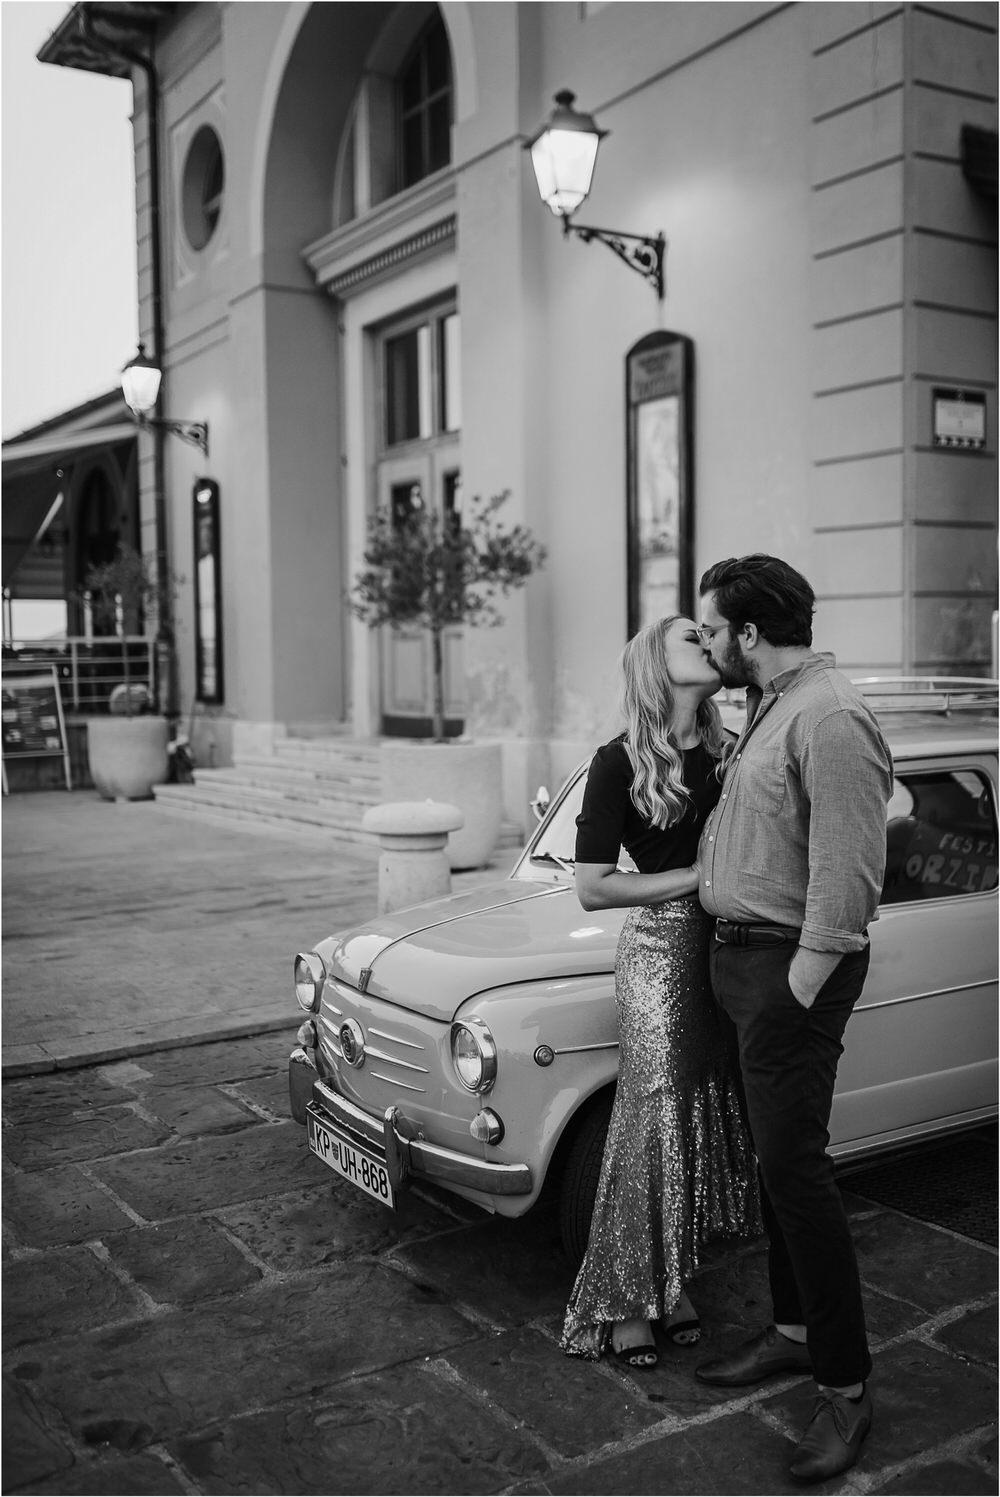 piran wedding photographer engagement anniversary honeymoon photography recommended slovenia seaside photographer  0069.jpg